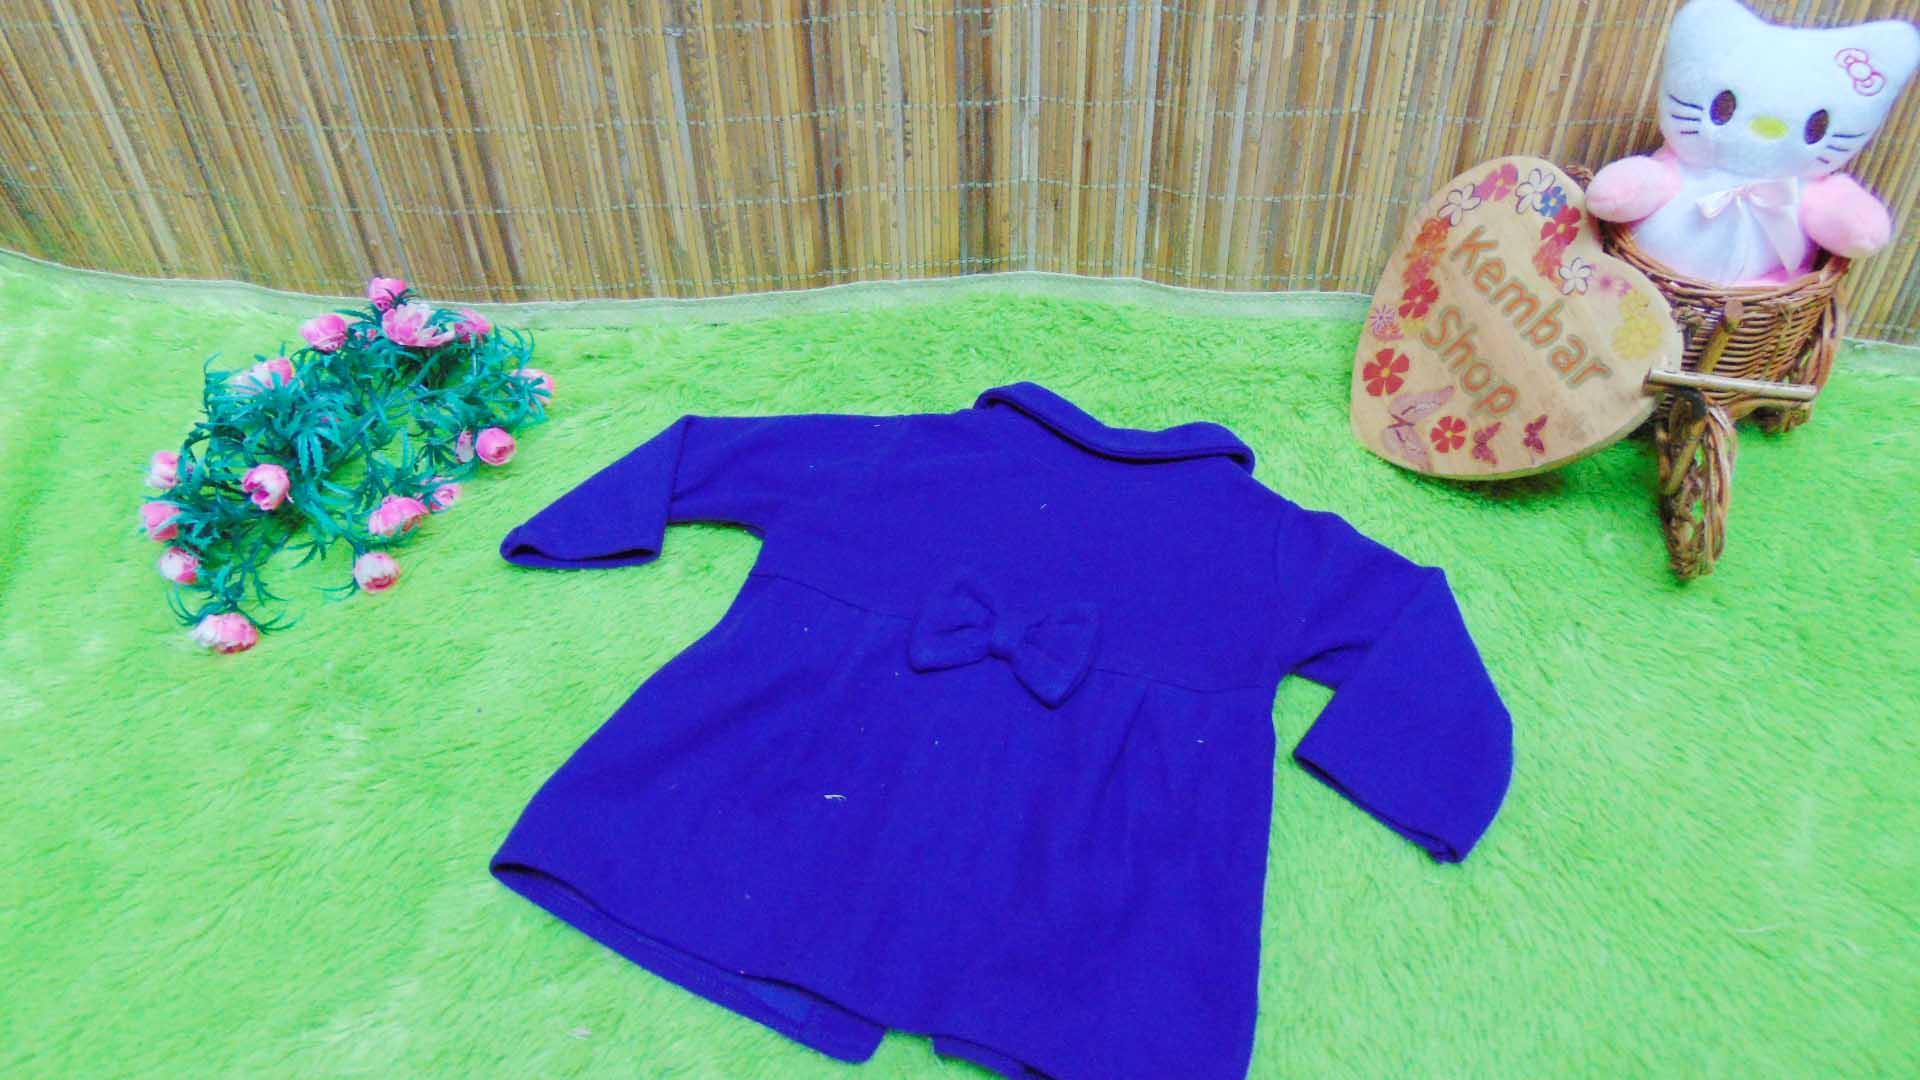 jaket bayi blazer baby mantel bayi hangat lembut 0-18bulan polos ungu (1)